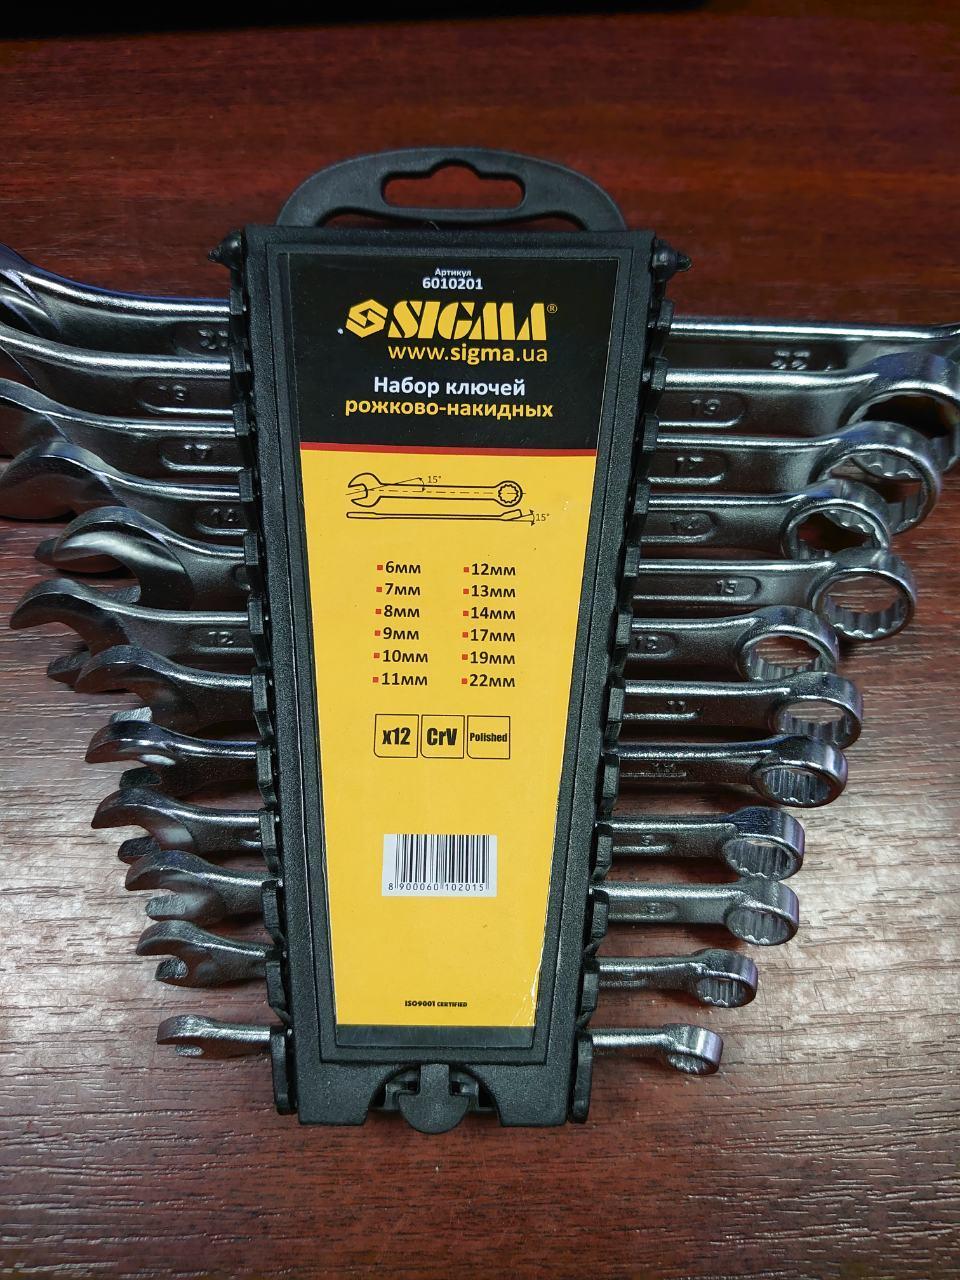 Набор ключей рожково-накидных Sigma 12 шт 6-22 мм CrV